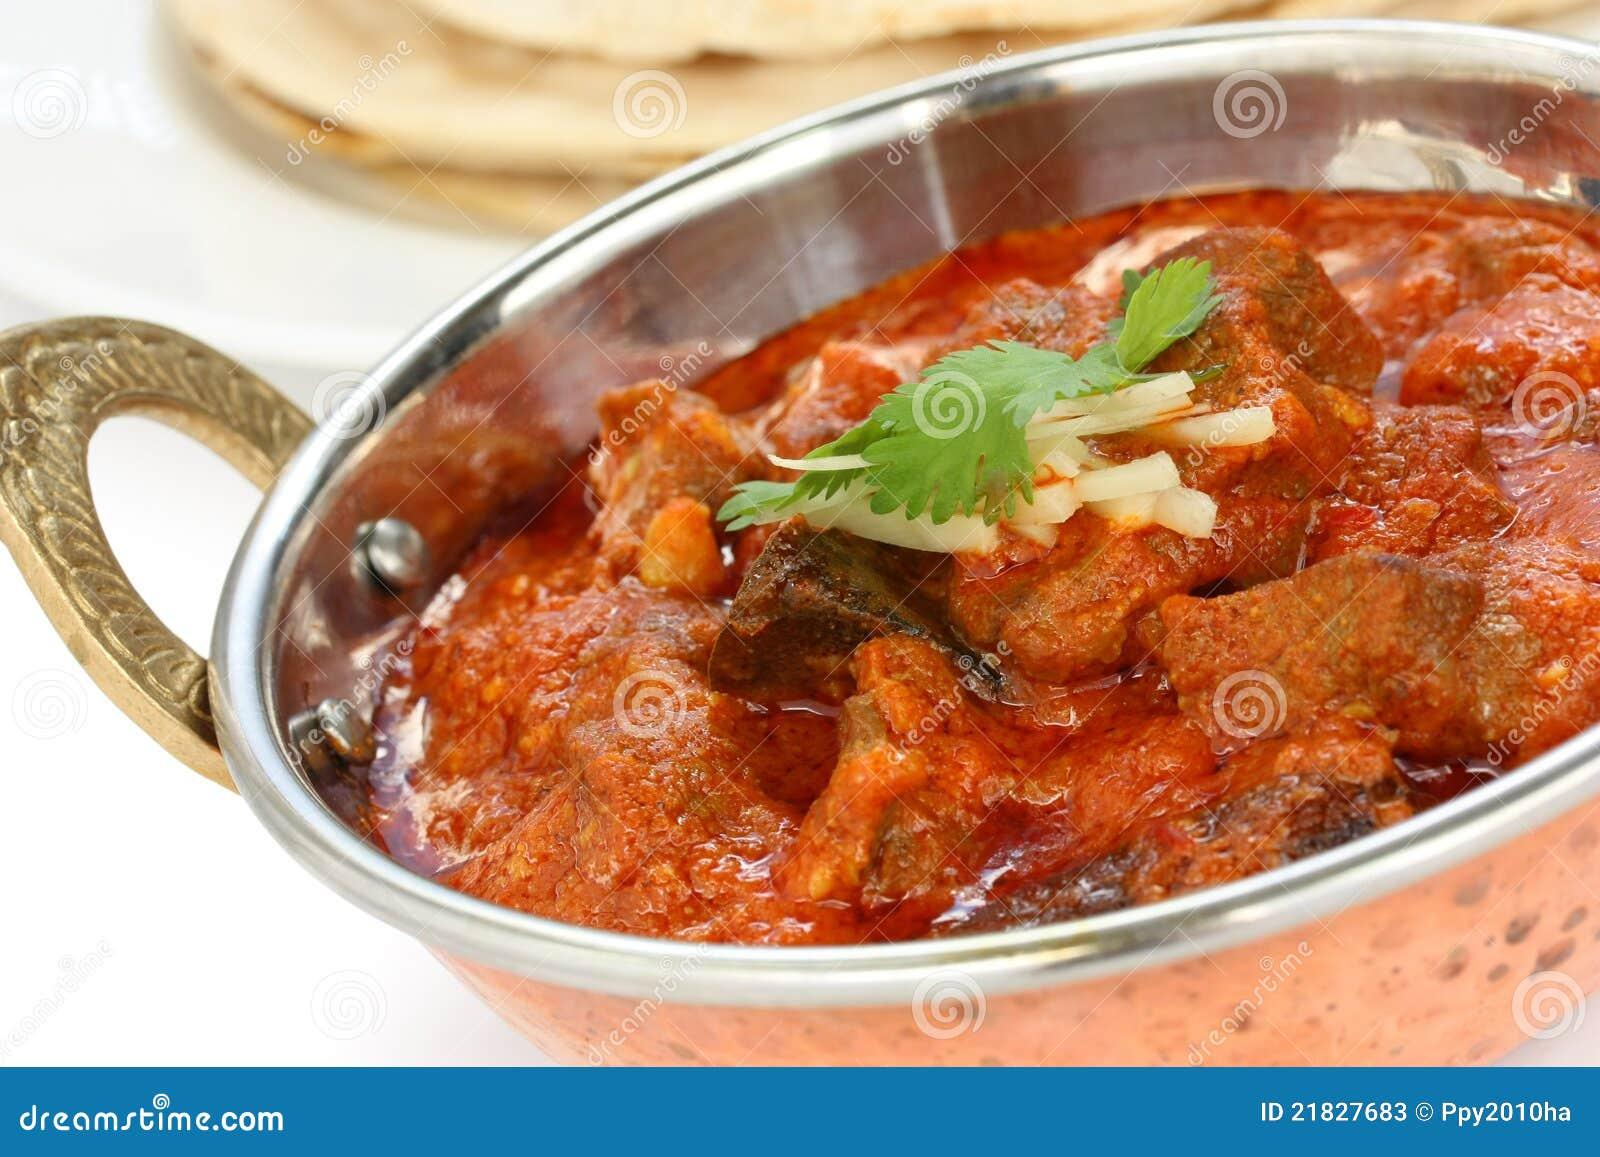 Josh rogan da carne de carneiro, caril da carne de carneiro, culinária indiana